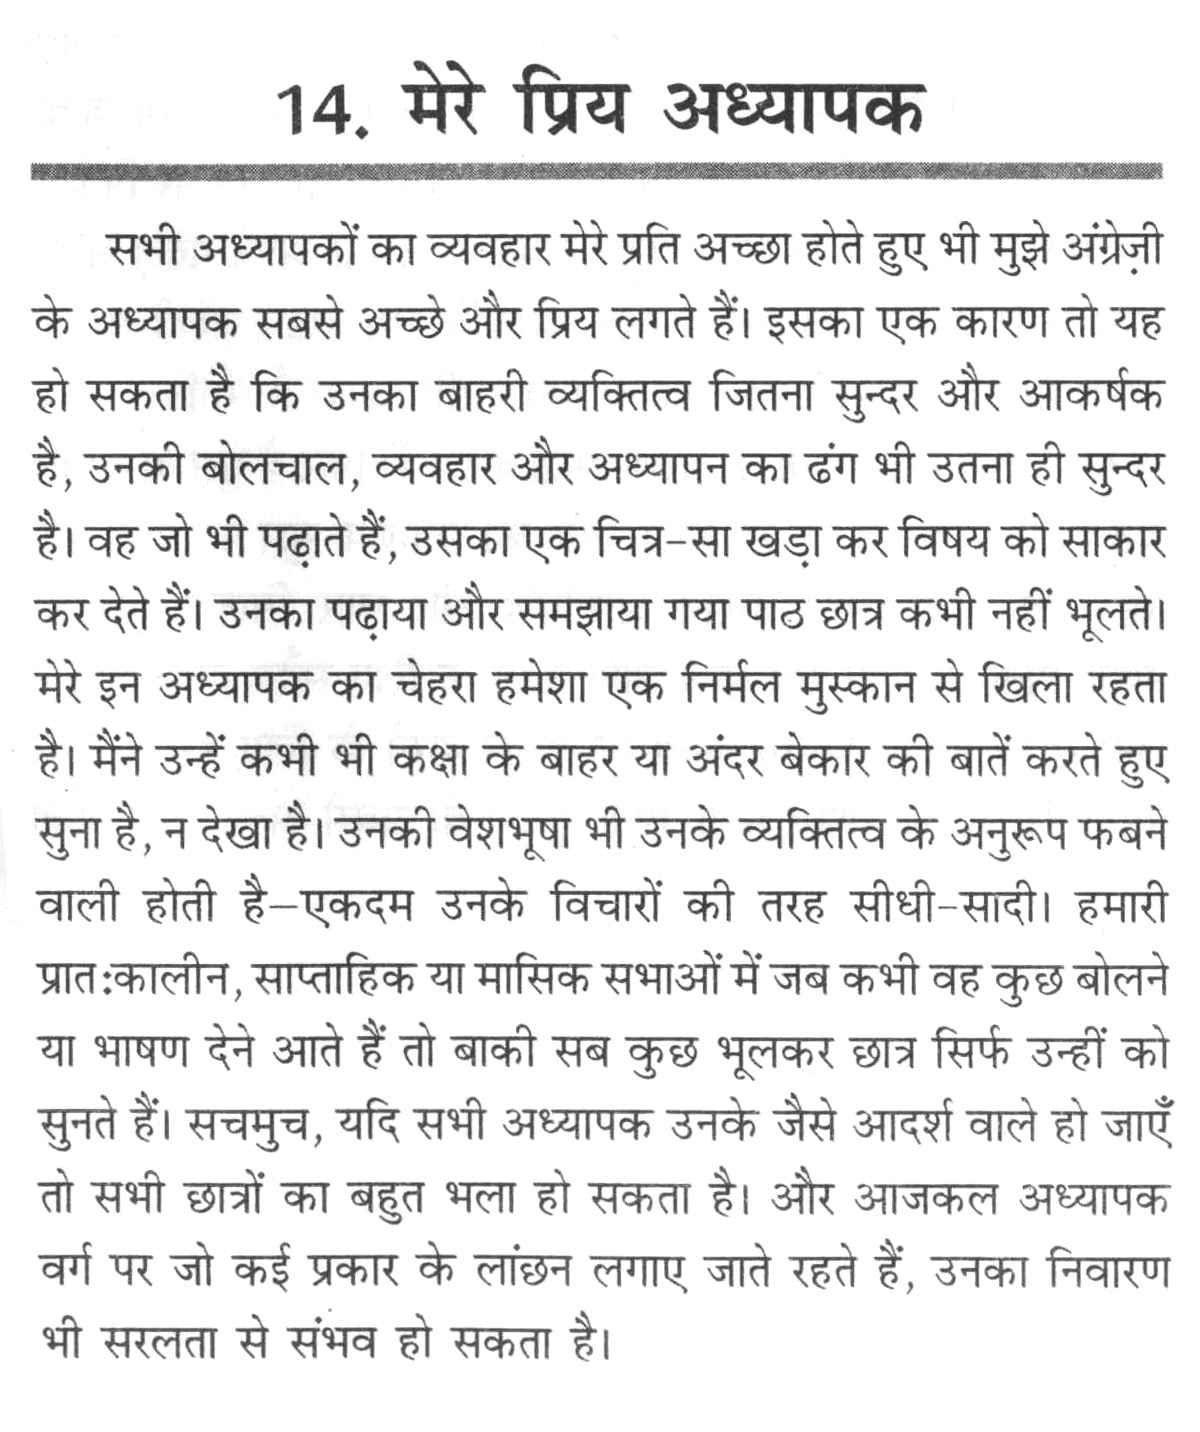 Raksha Bandhan Essay in Hindi Essay on teachers day, My